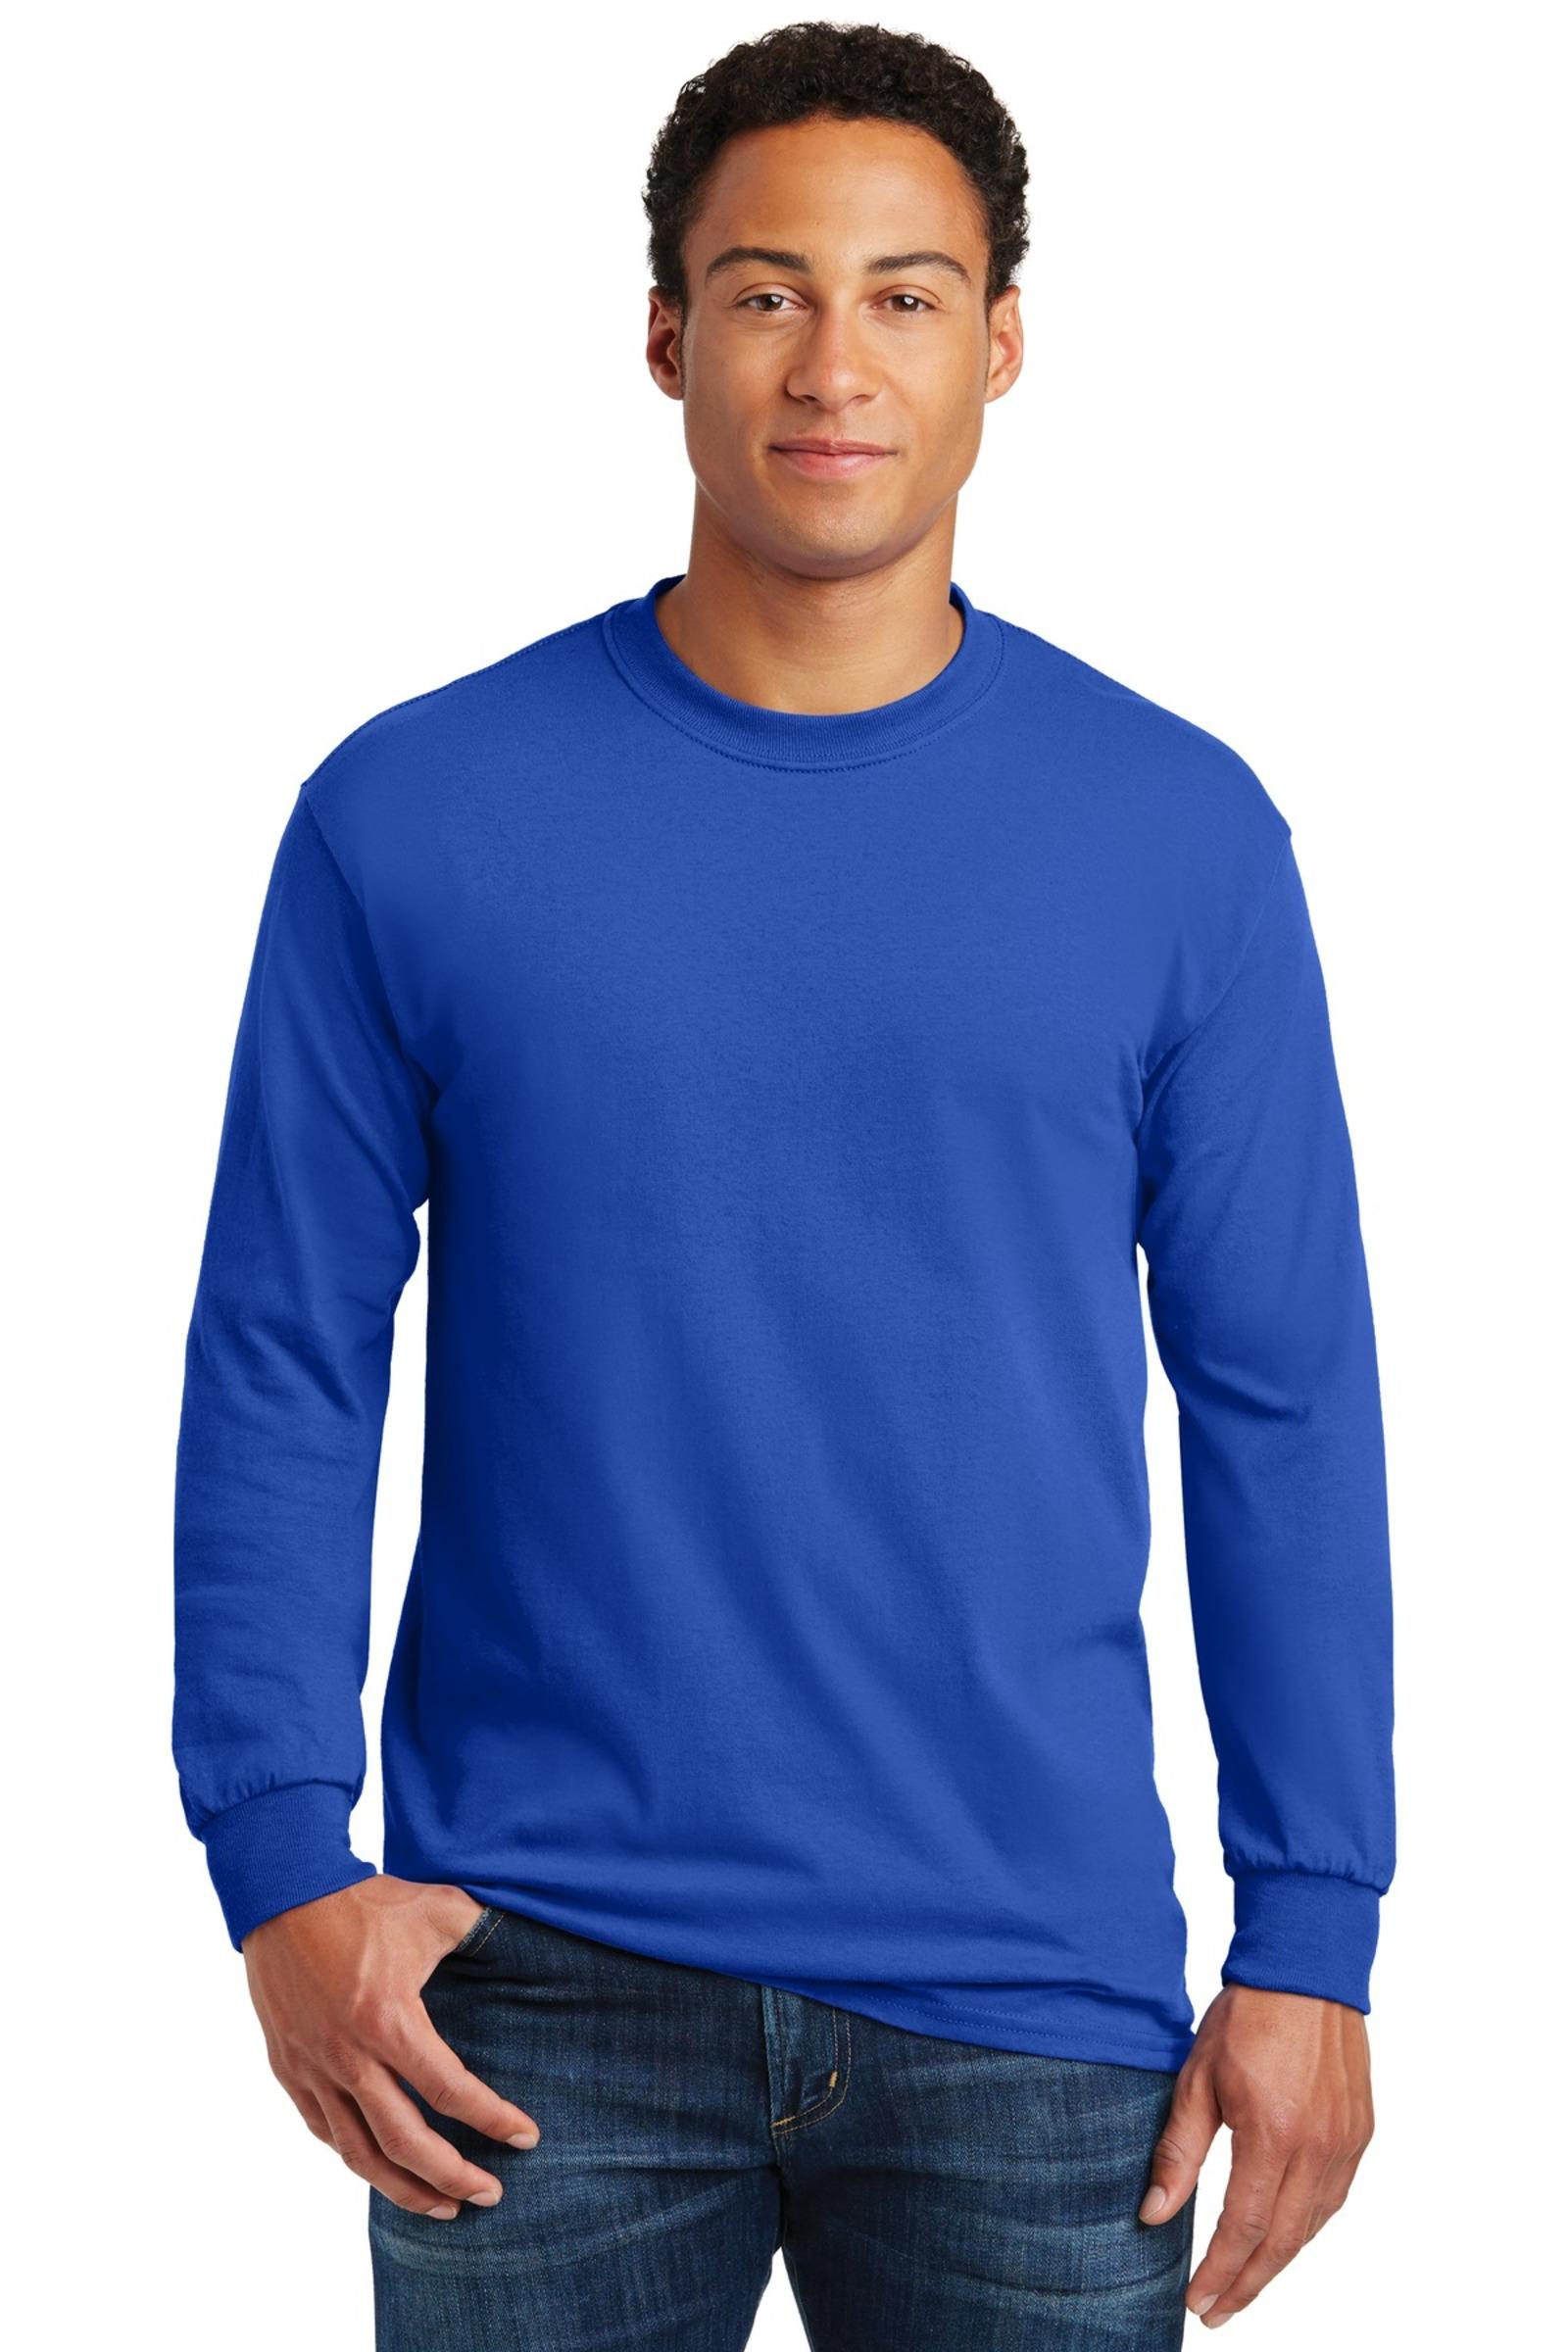 Gildan Embroidered Men's Heavy Cotton 100% Cotton Long Sleeve T-Shirt